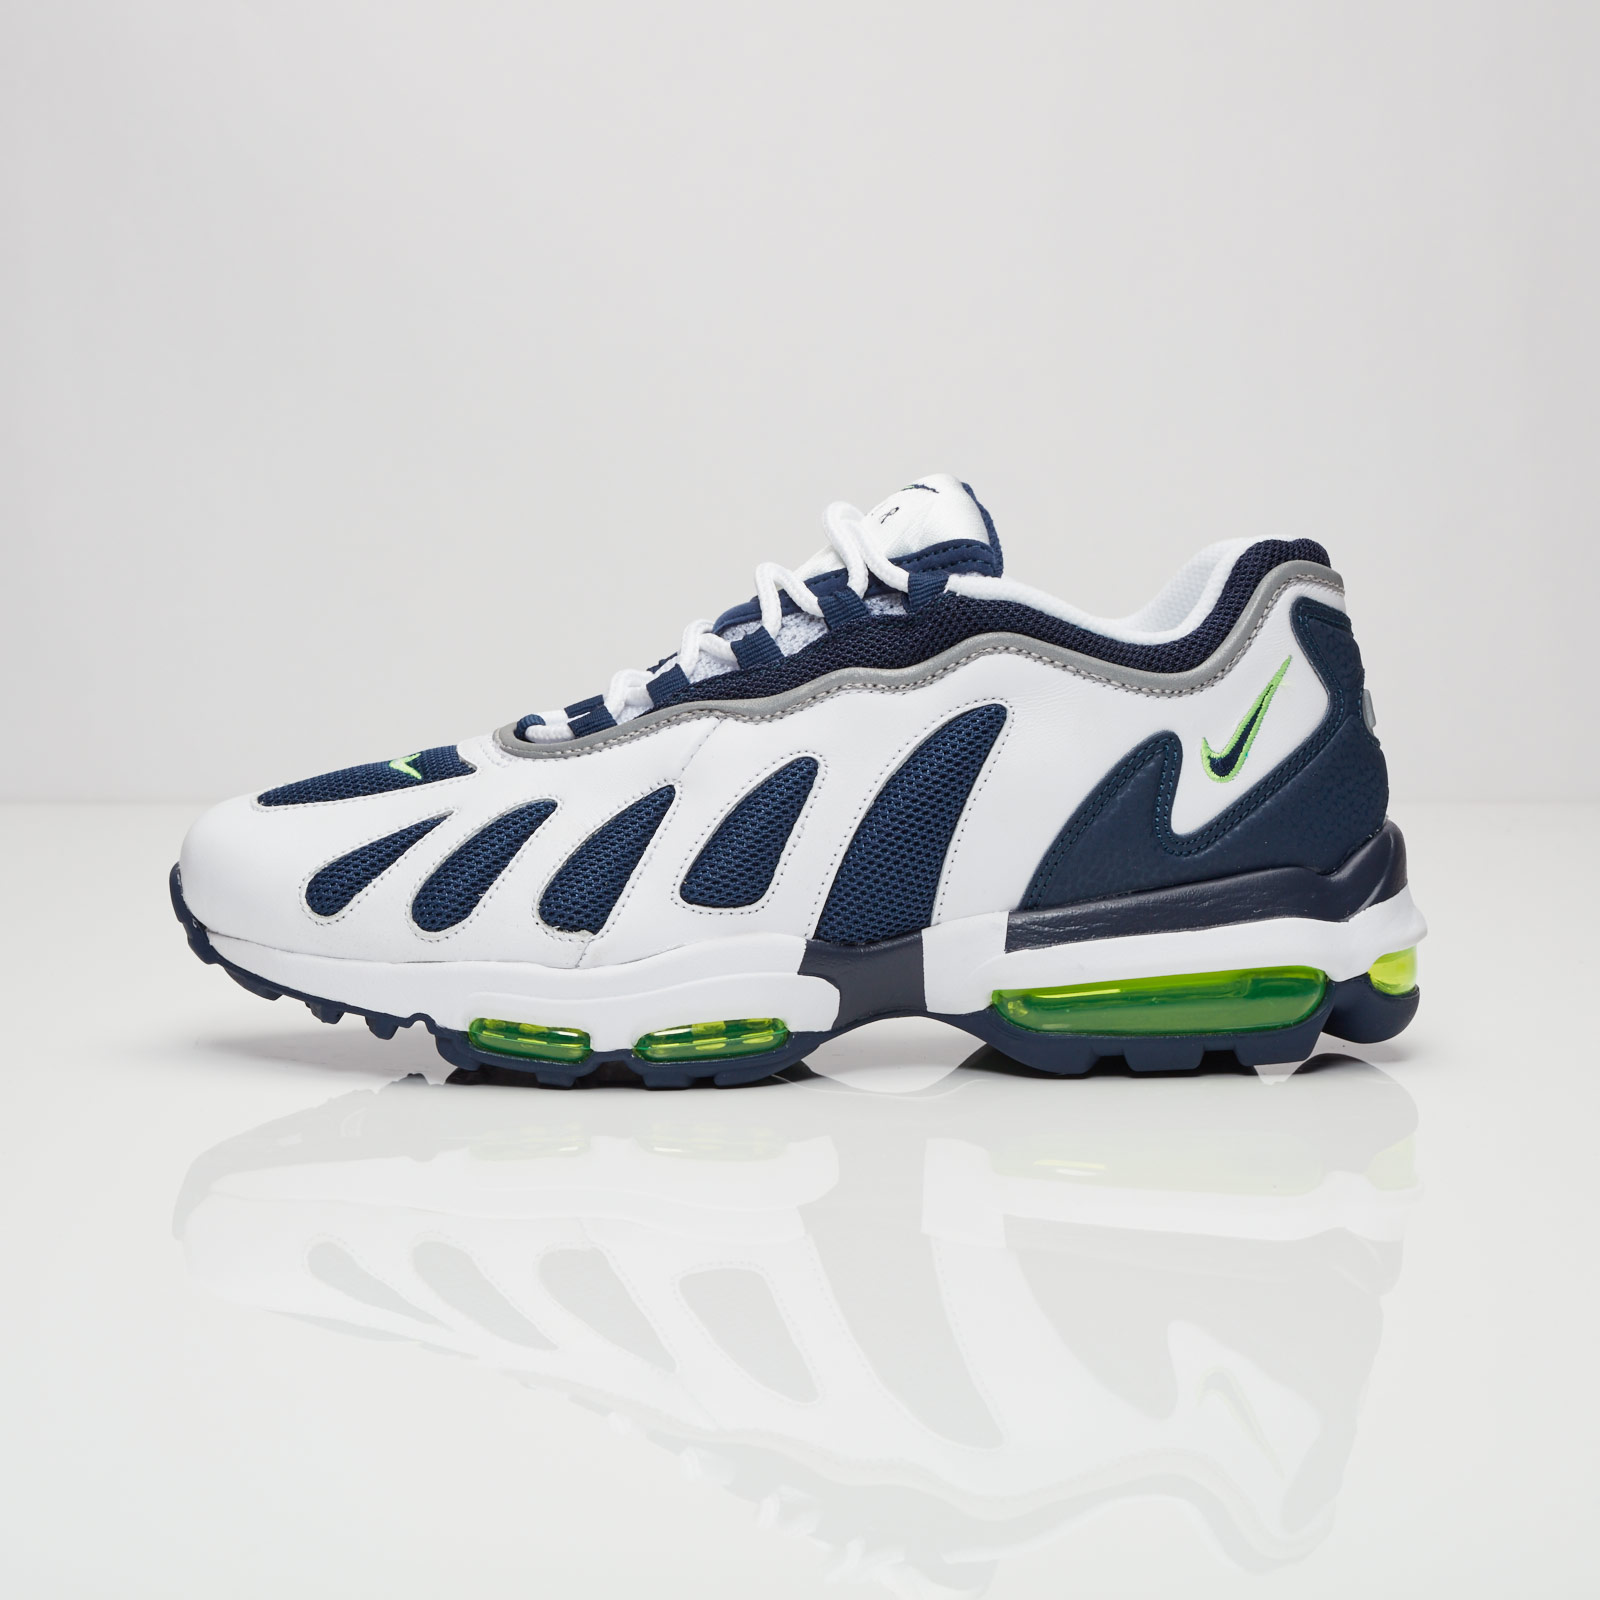 0925fc7928ff42 Nike Air Max 96 XX - 870165-100 - Sneakersnstuff